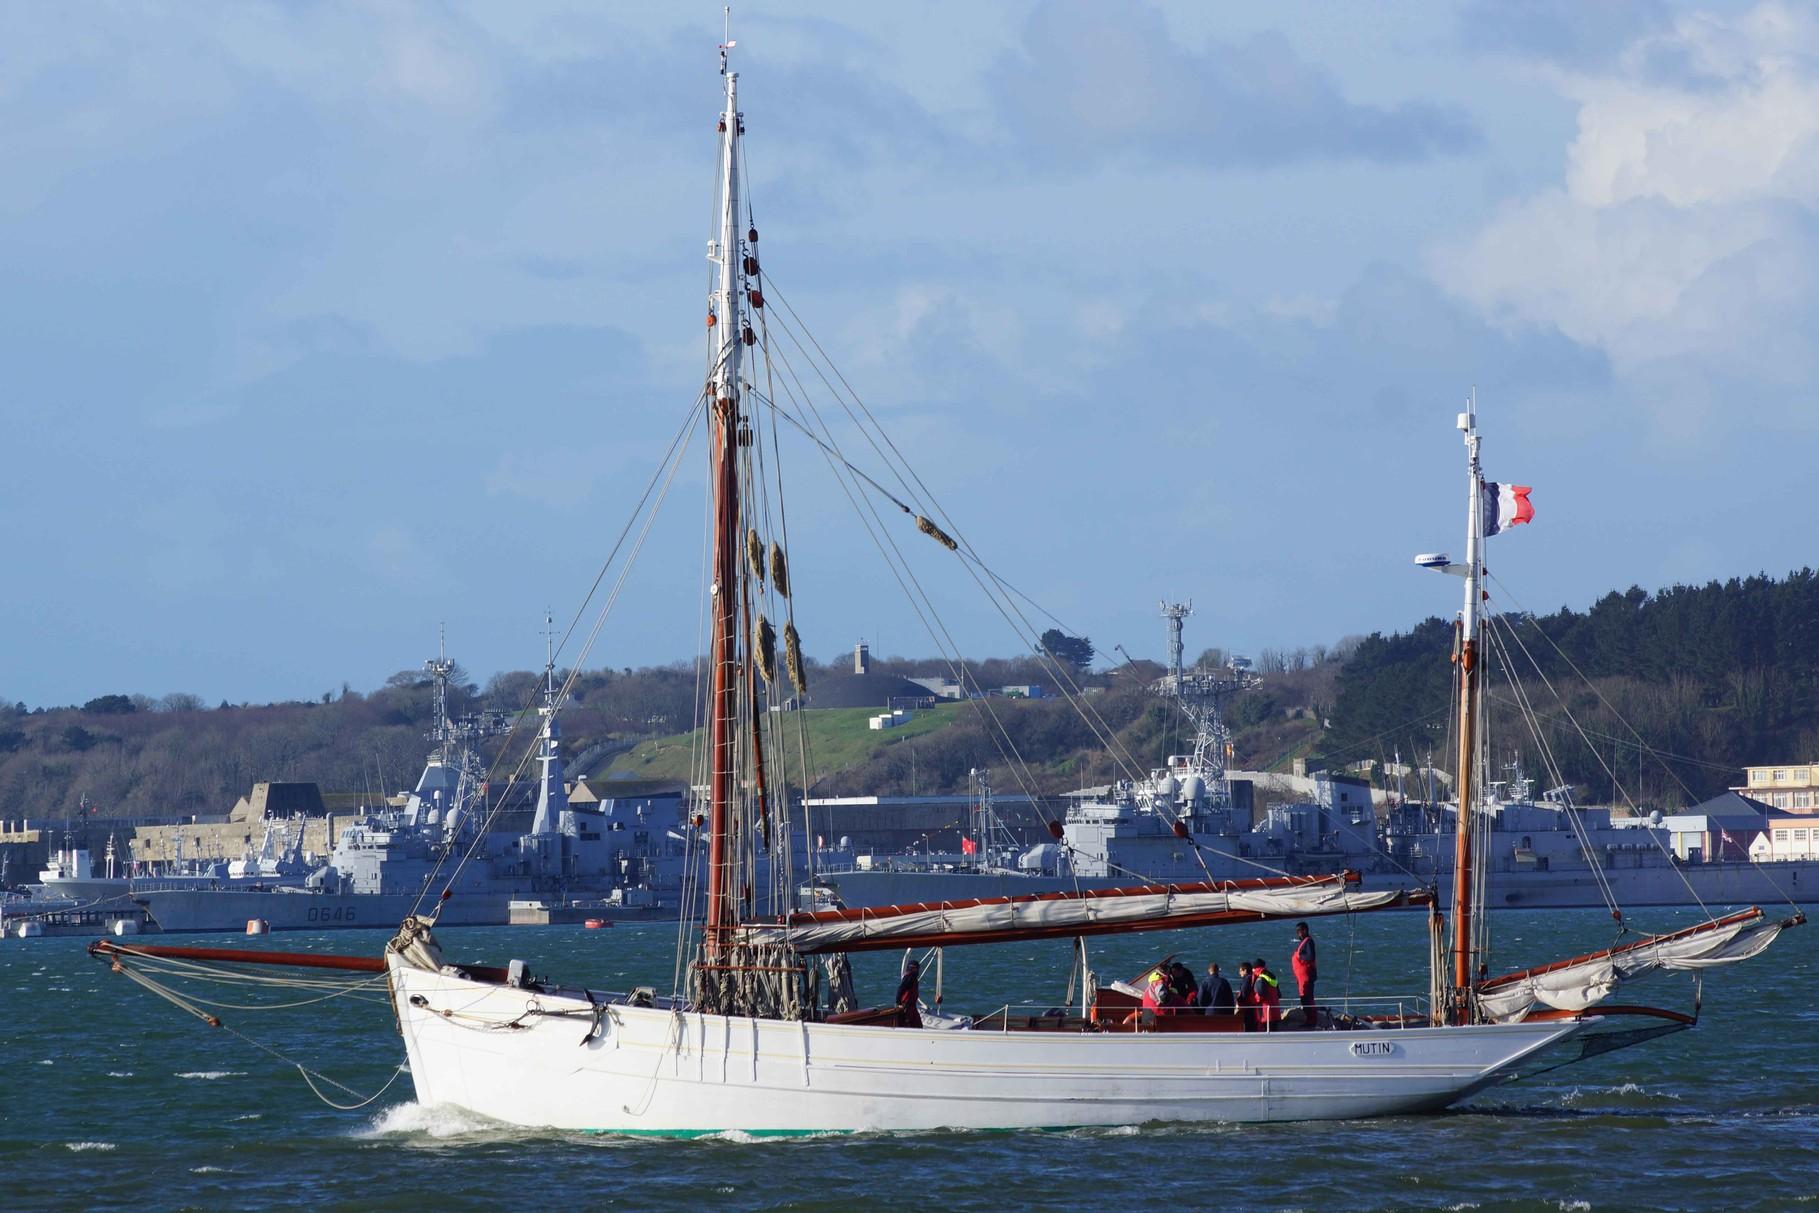 Mutin, Navire Héros de la Marine Nationale